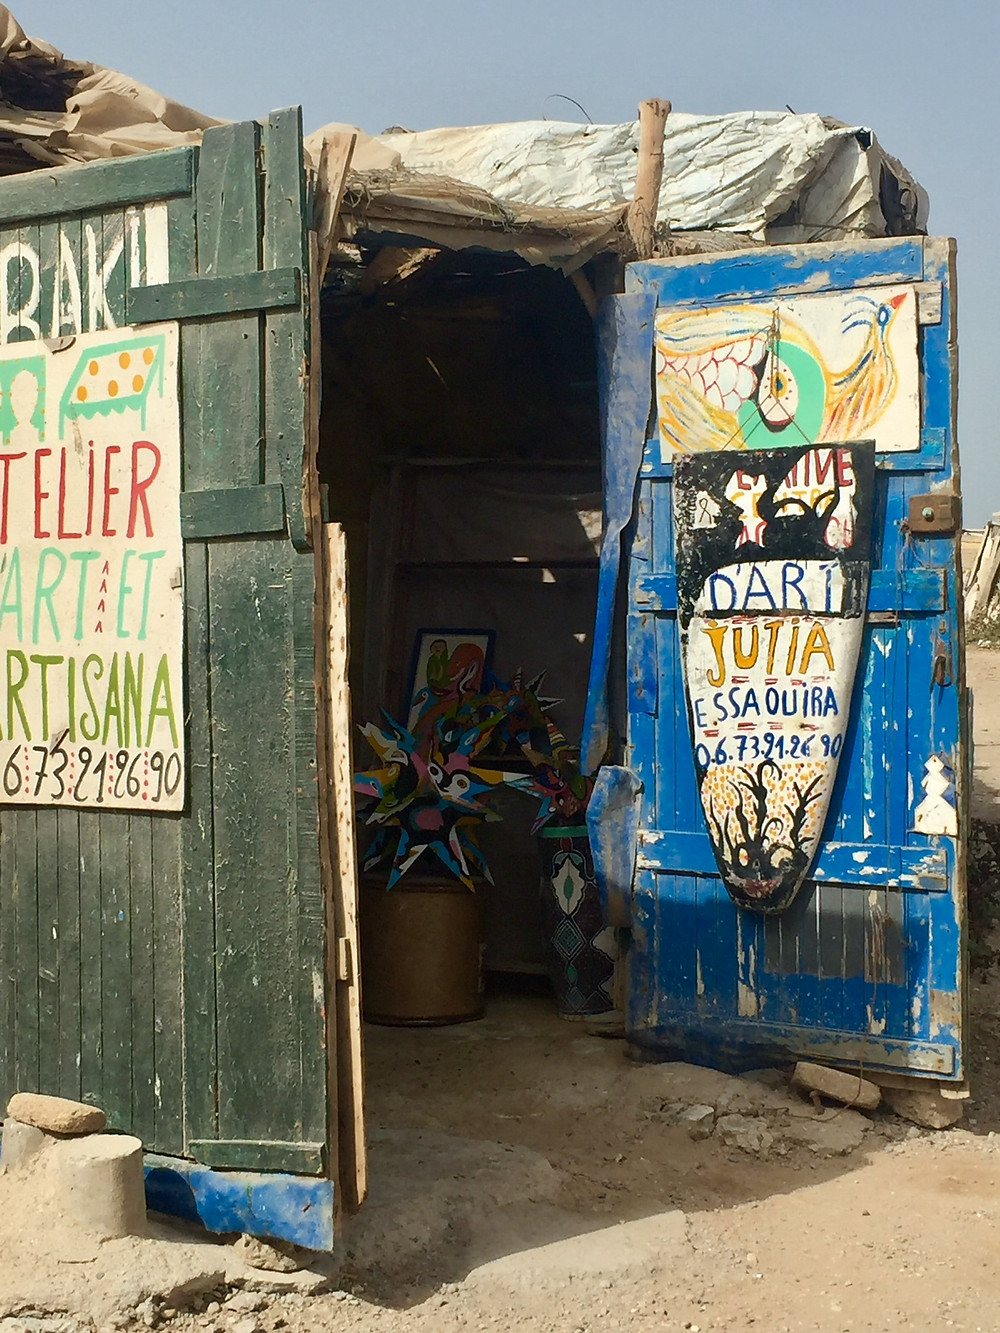 Baki/ la joutia Essaouira / riad le consulat